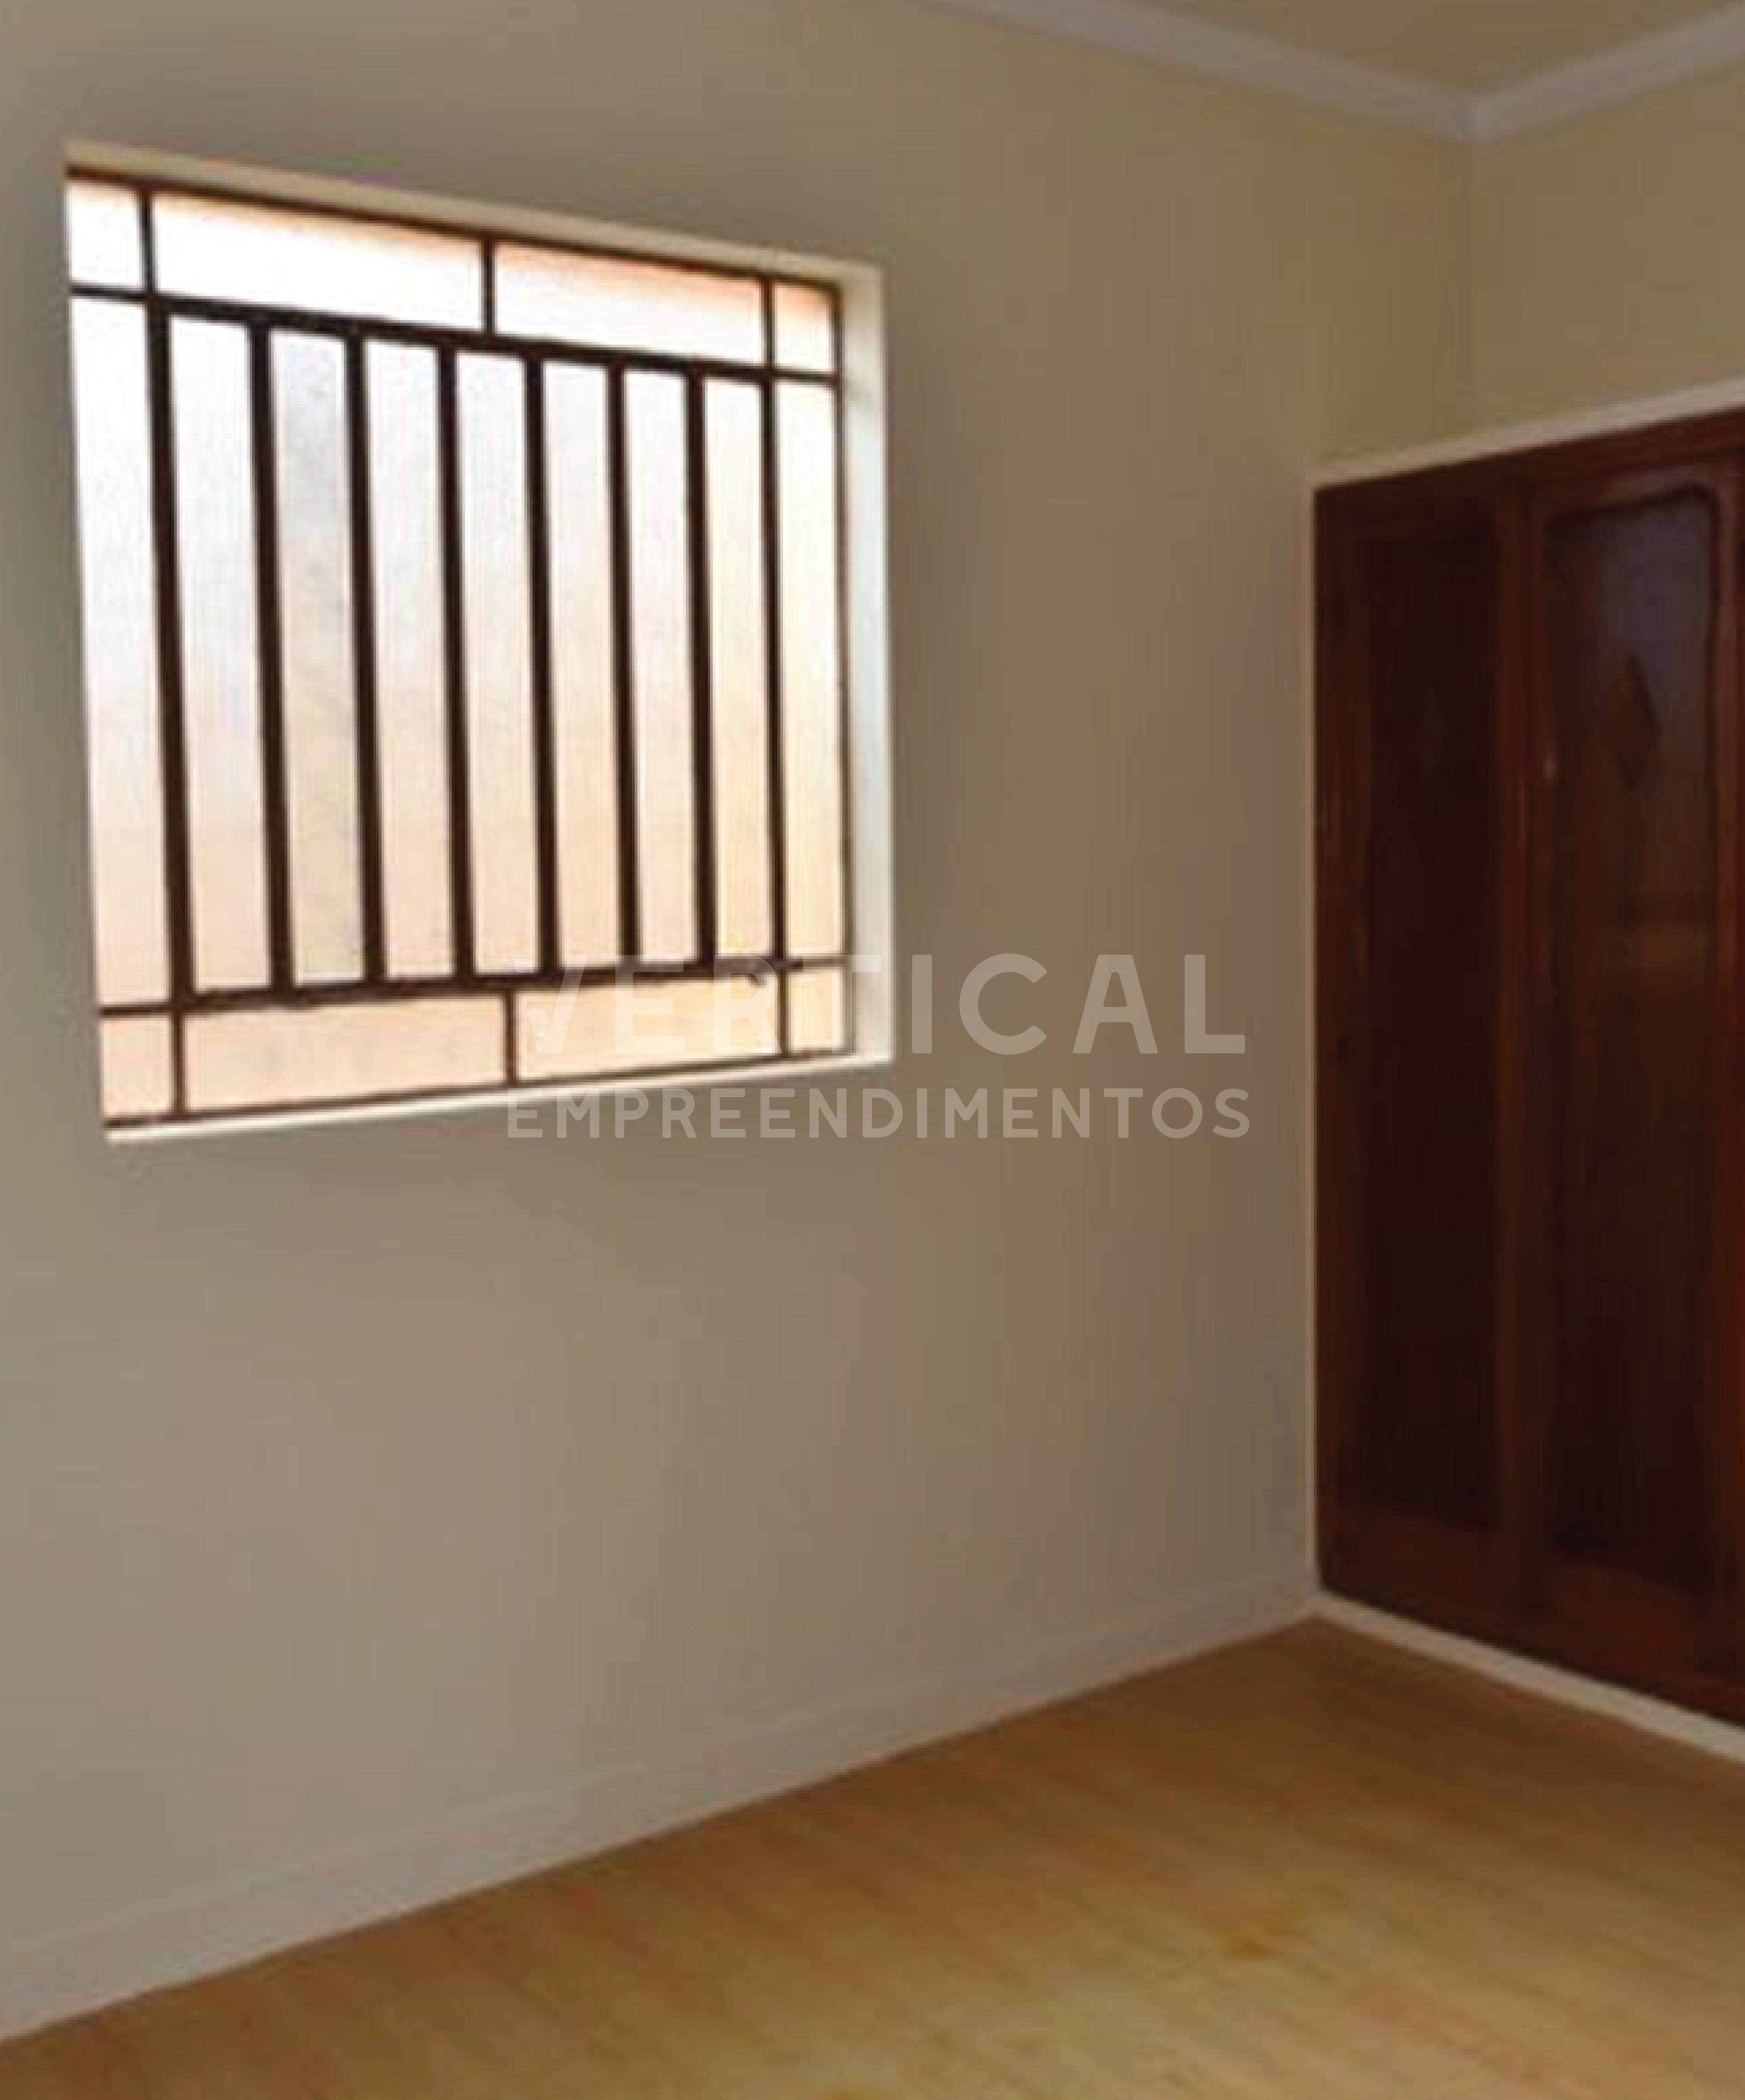 imoveis-a-venda-bh-zap-imoveis-net-imoveis-apartamento-concordia-central-bh-olx-apartamentos-baratos